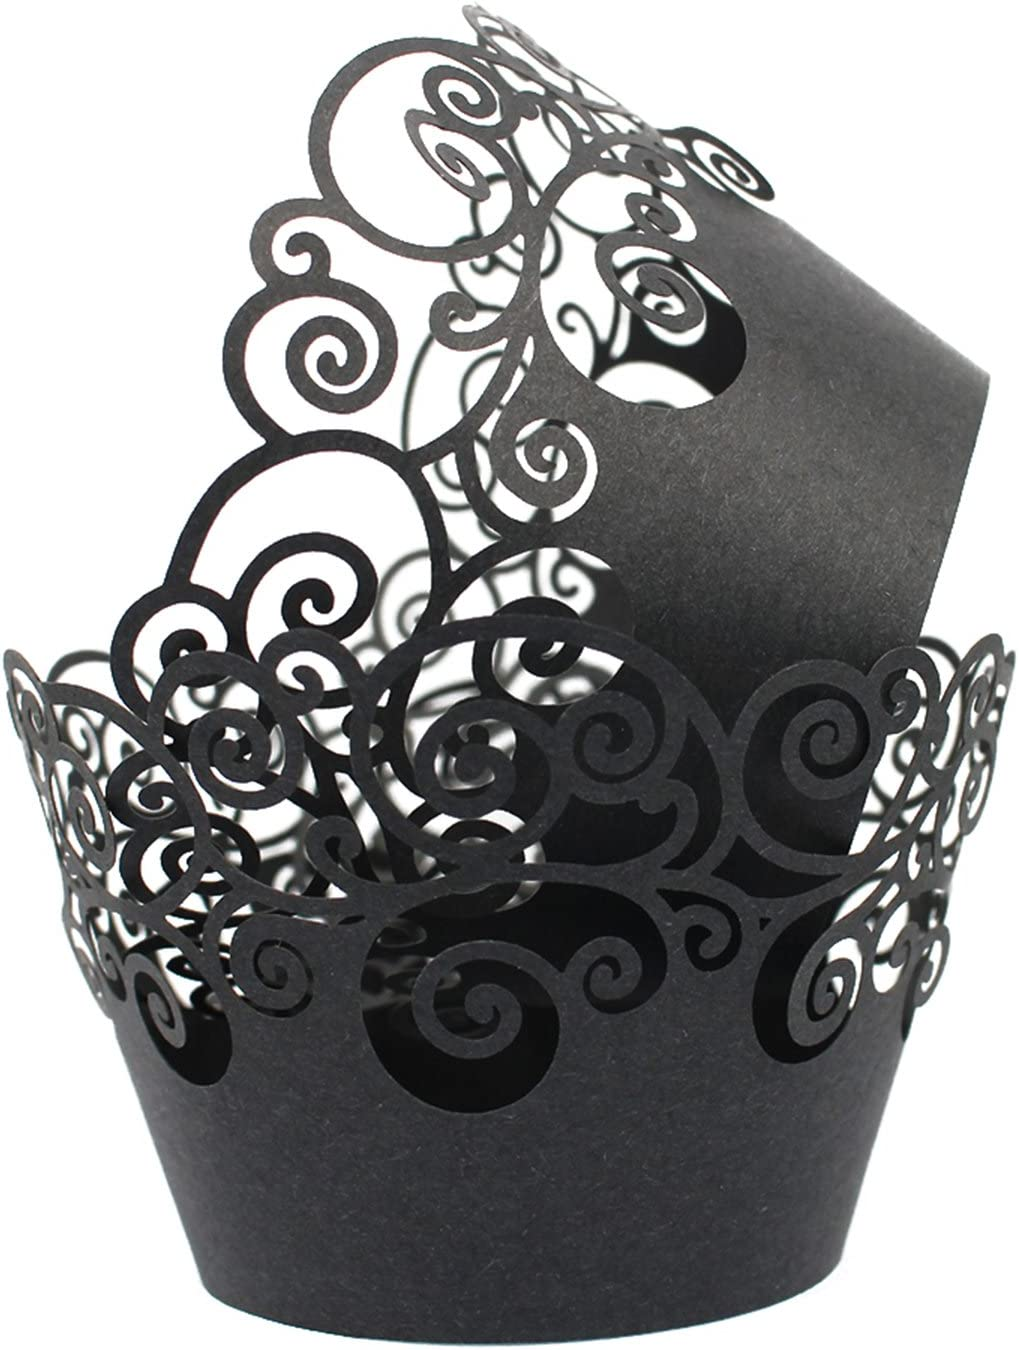 KPOSIYA Cupcake Wrappers 60 Filigree Cu Bake Gifts Paper Cake At the price Artistic